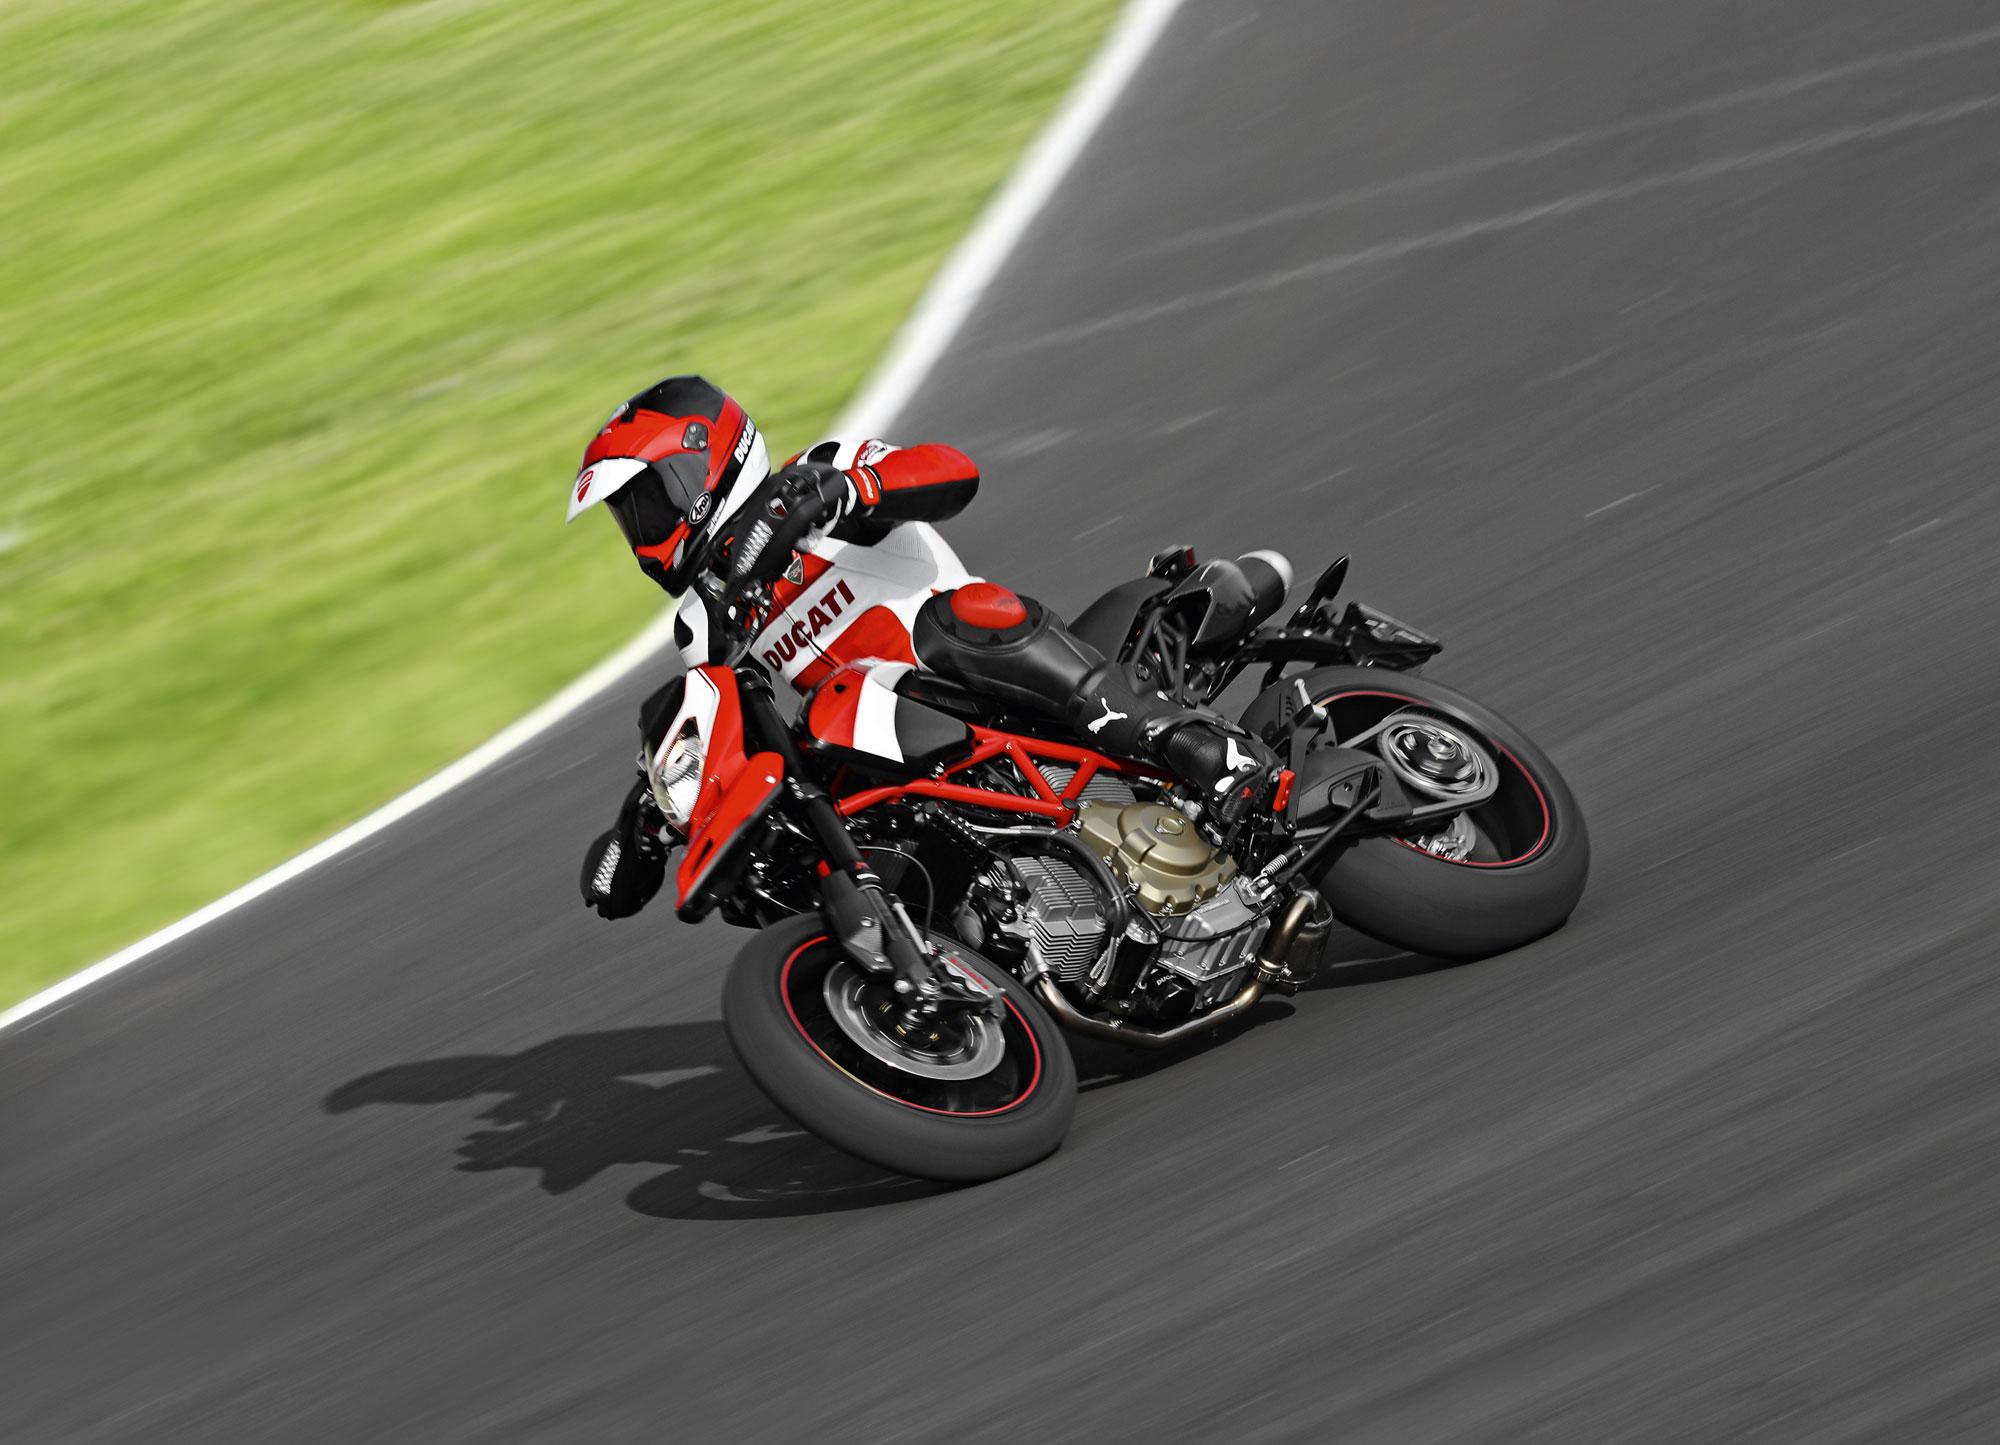 Ducati Hypermotard 1100 EVO - 2000x1445